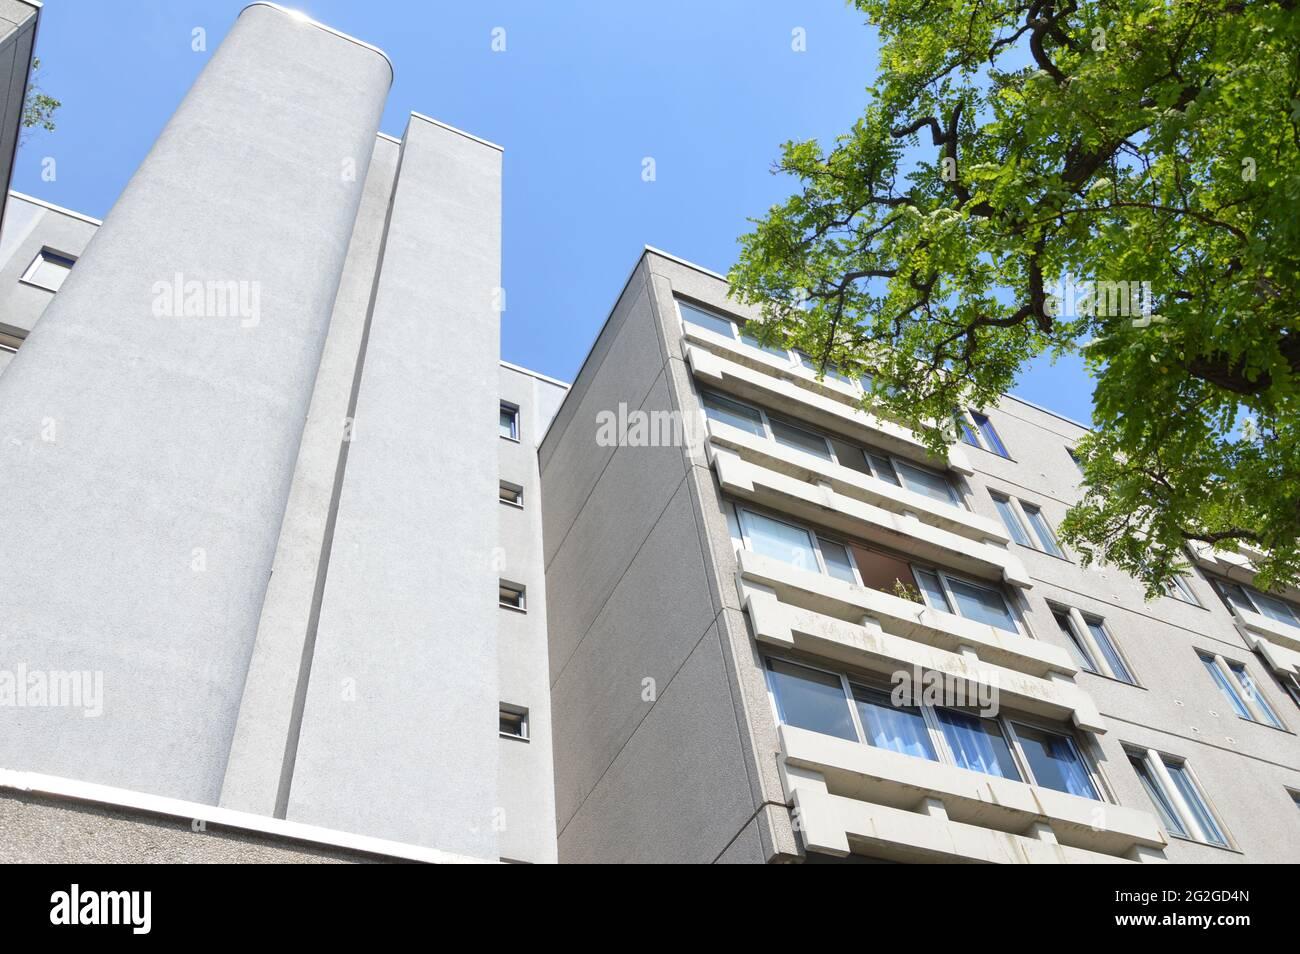 Schöneberger Terassen residential area in Berlin, Germany - 10th June 2021. Stock Photo